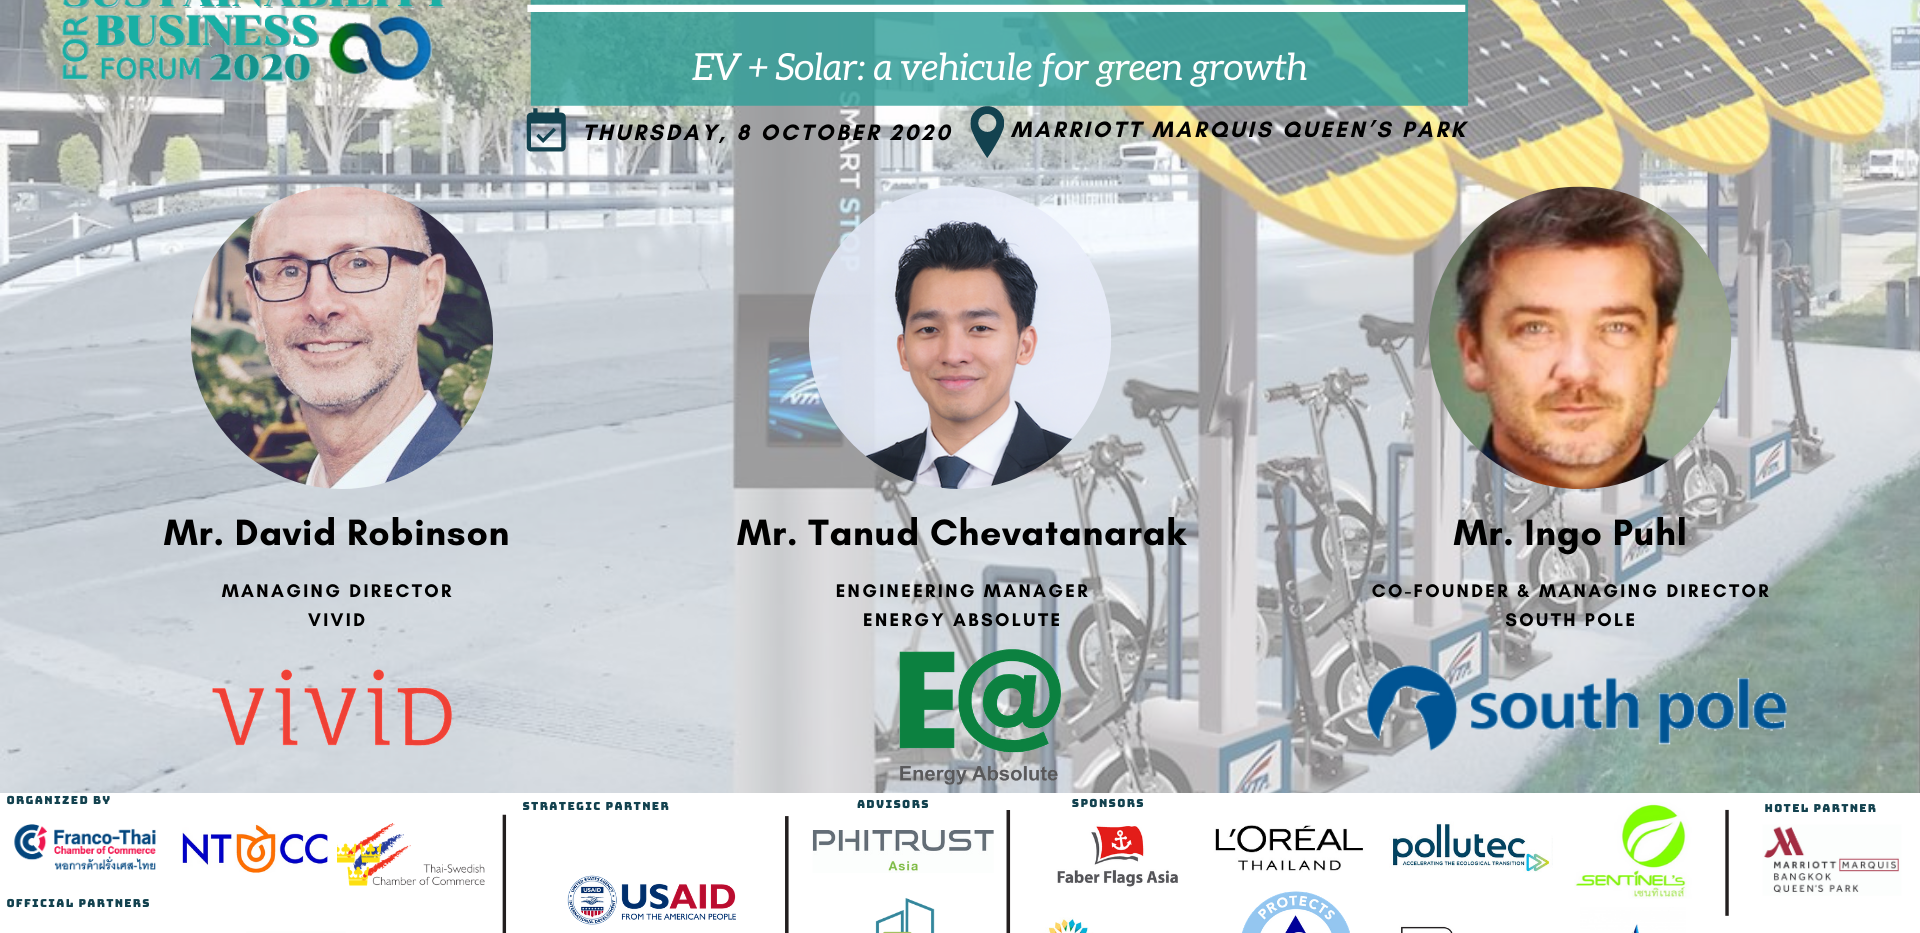 EV + Solar